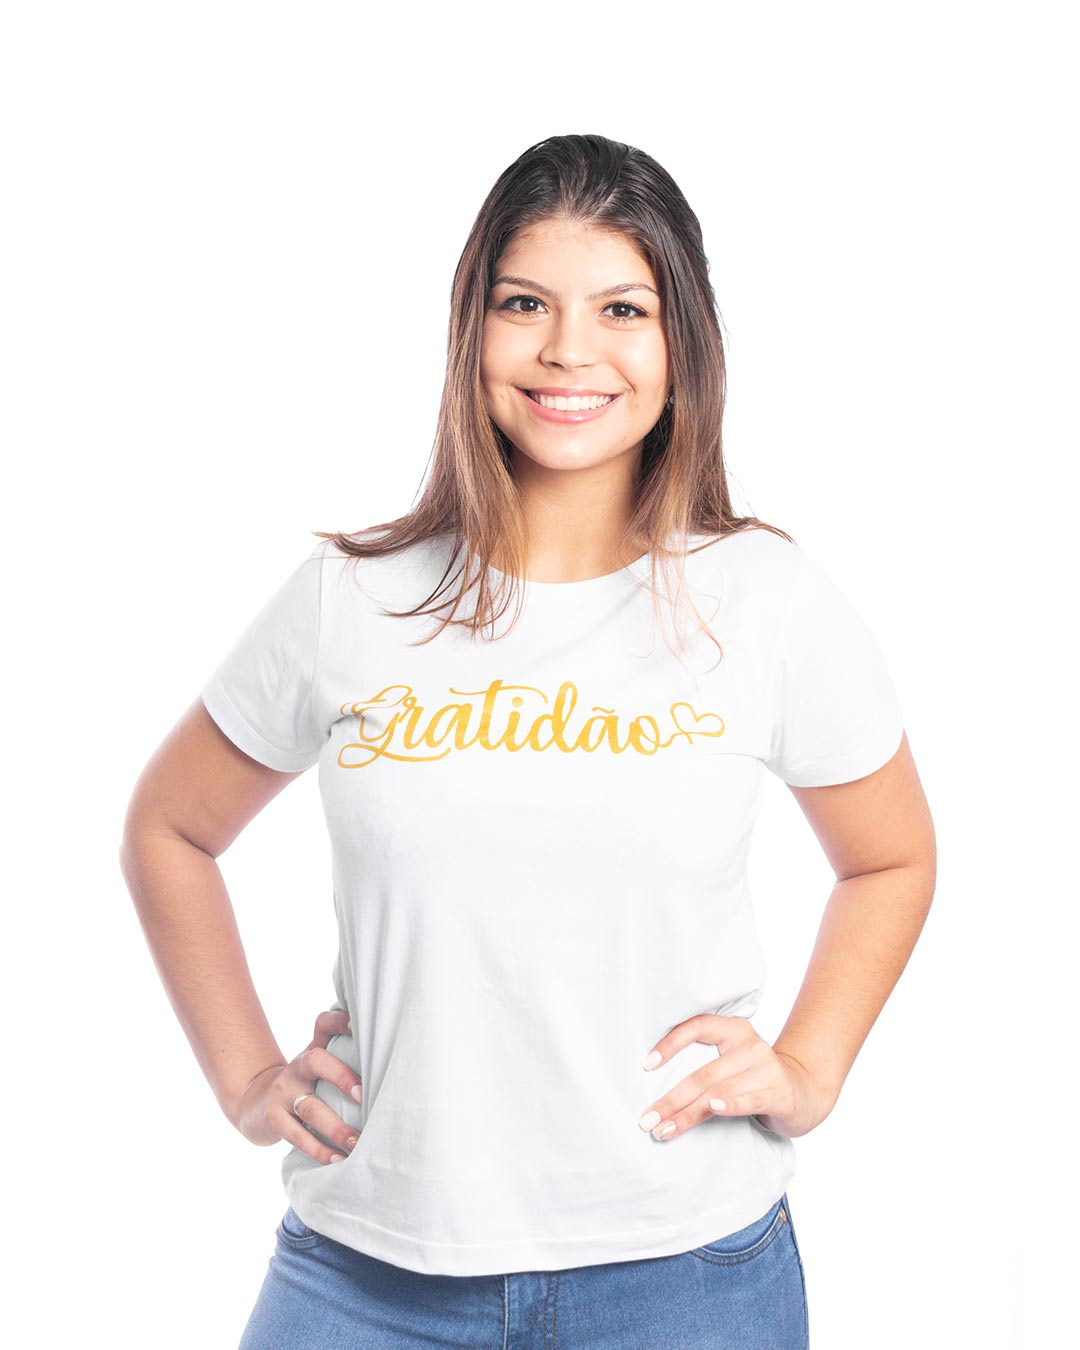 T-Shirt Adulta e Plus Size Gratidão Branco - Santa Margô